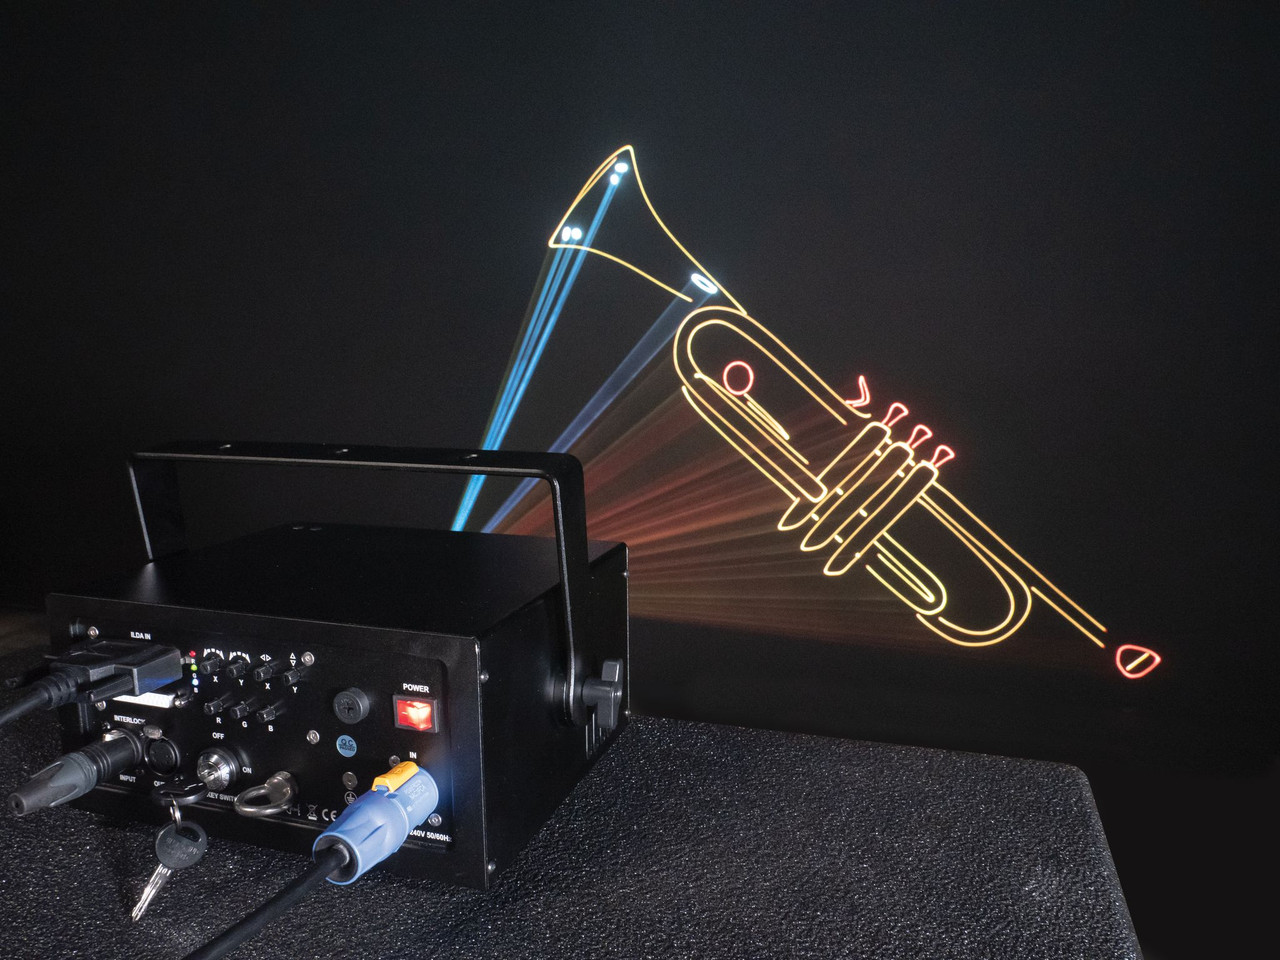 Unity Lasers ELITE 3 PRO FB4 Laser Light Show Projector